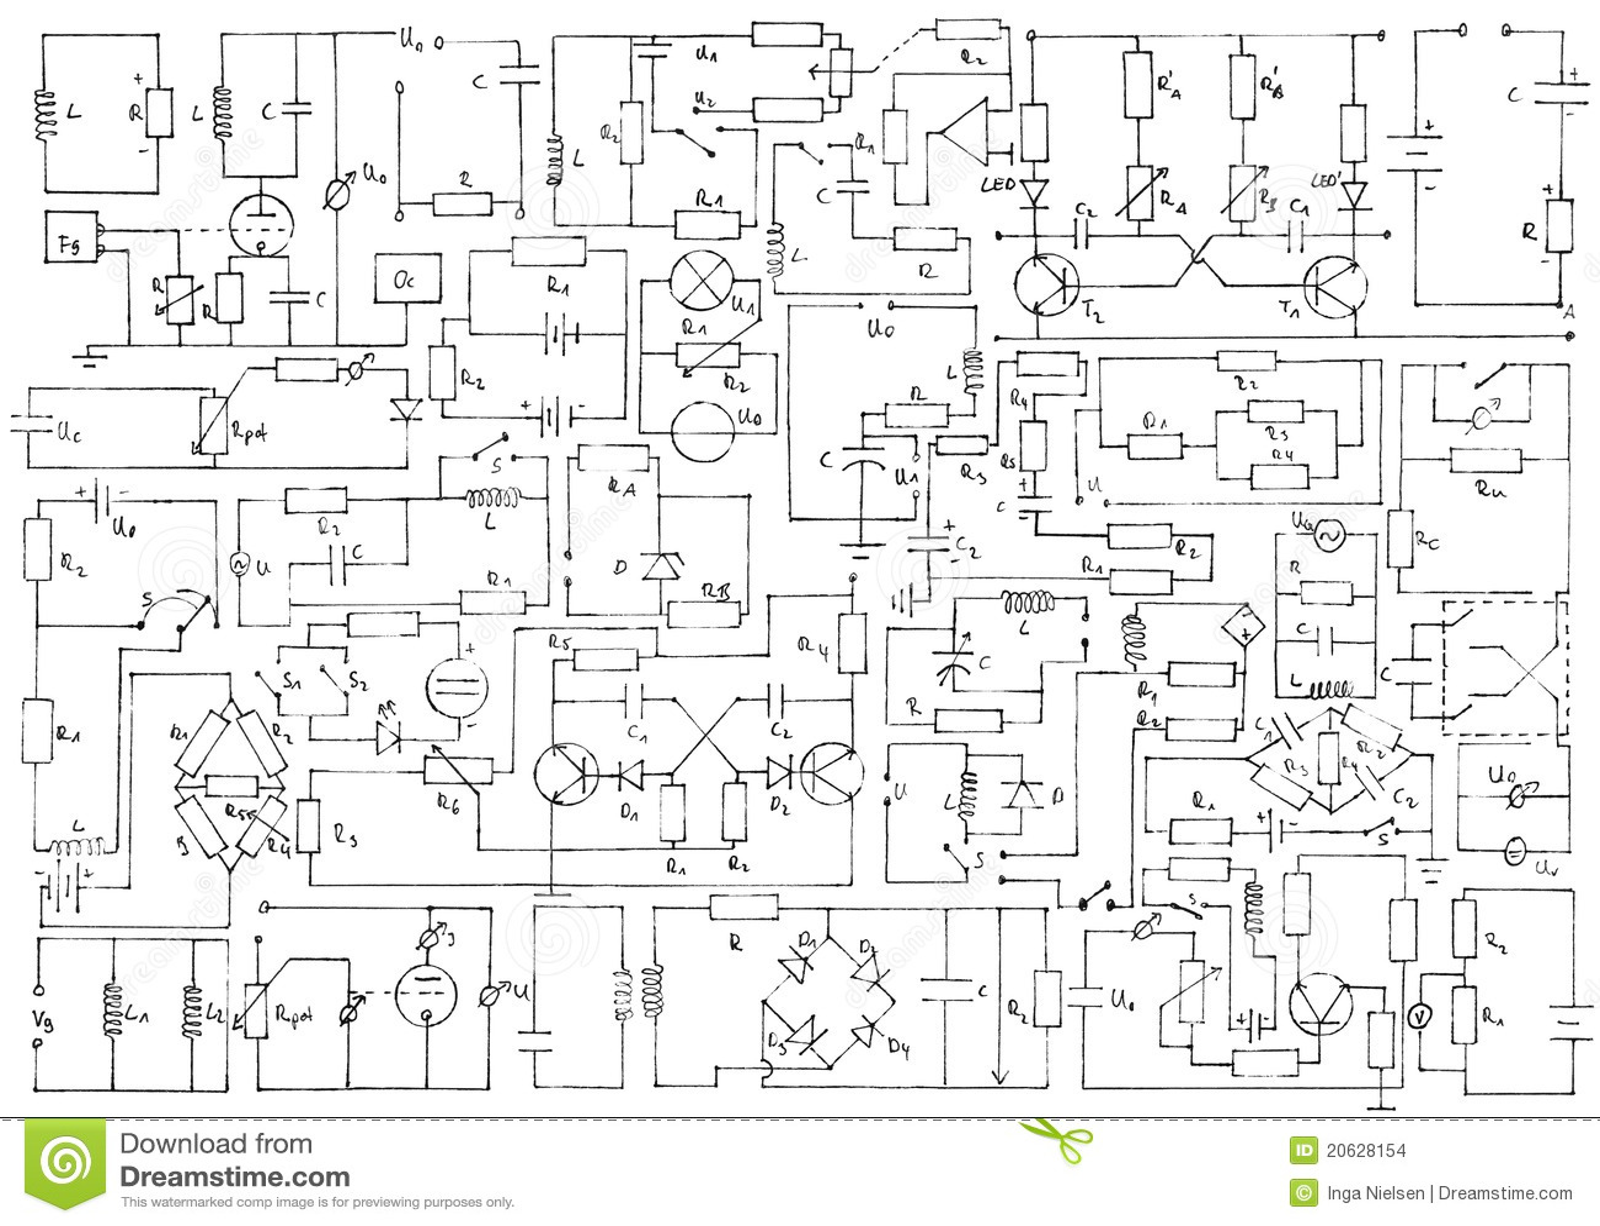 Ram W250 W350 15 Meyer Snow Plow Wiring Diagram Emprendedorlink